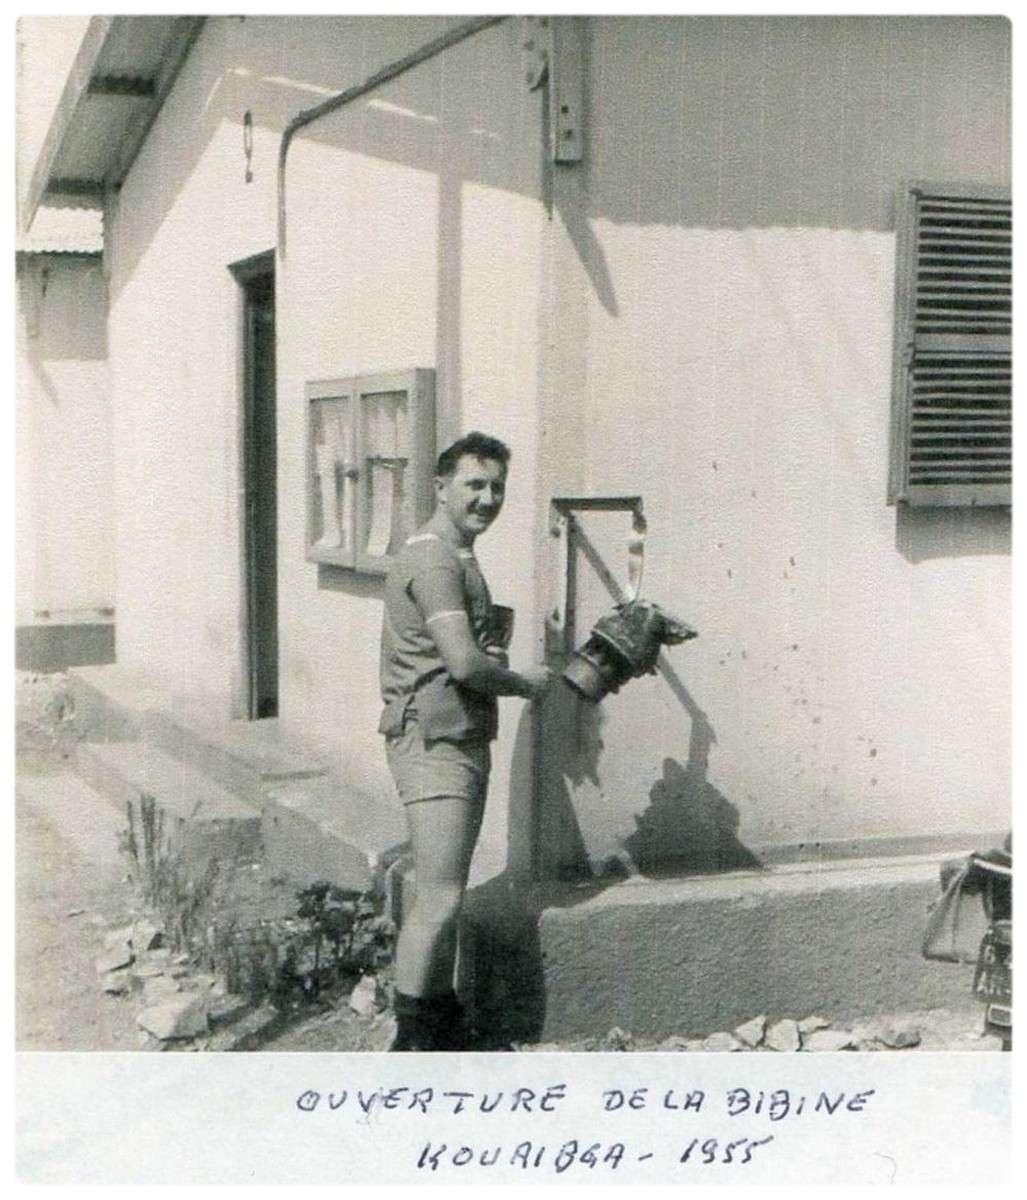 [LES B.A.N.] KHOURIBGA - MAROC 379